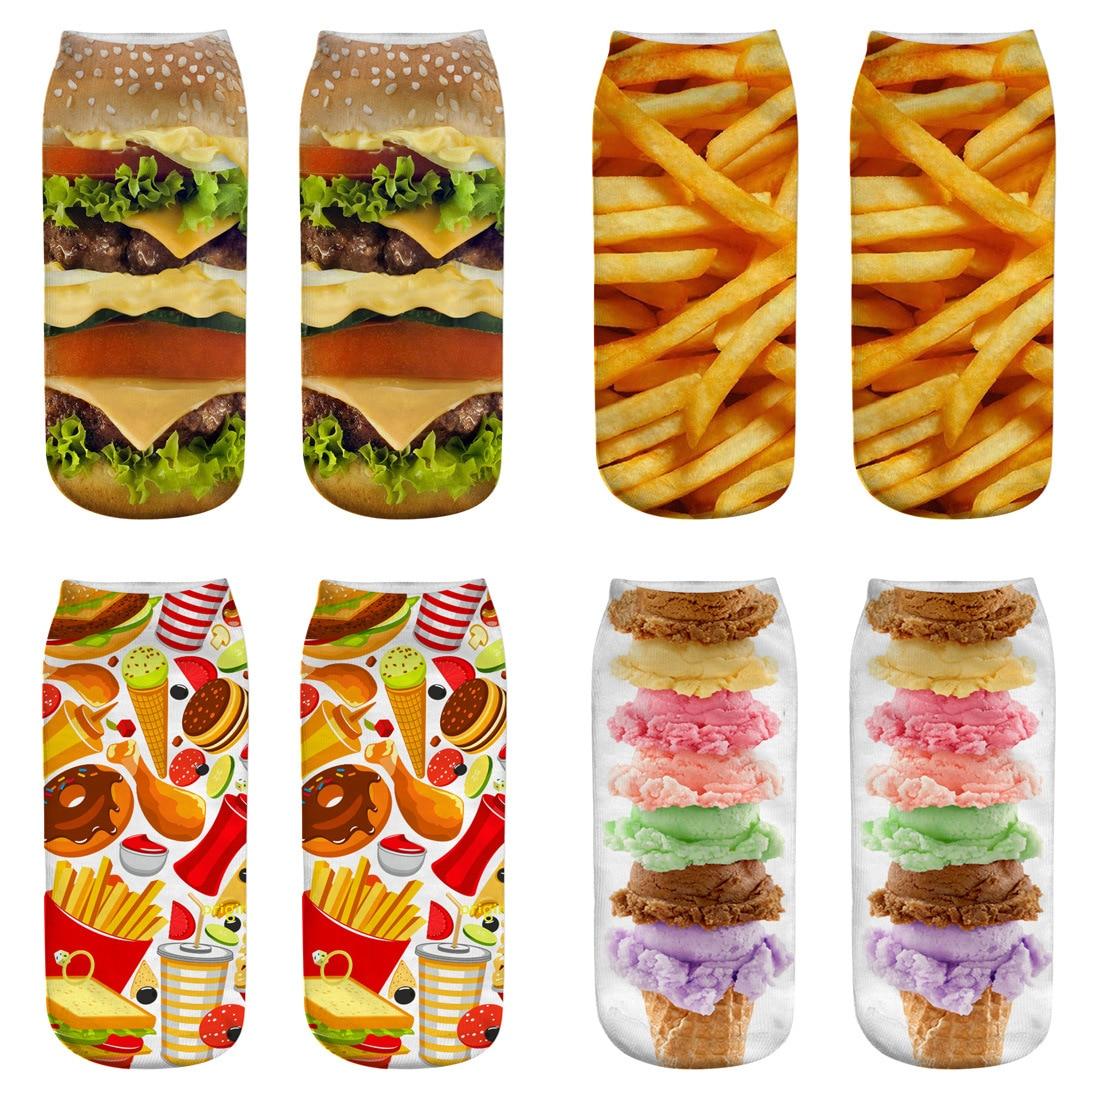 Hamburg French fries 3D printed socks for women creative funny